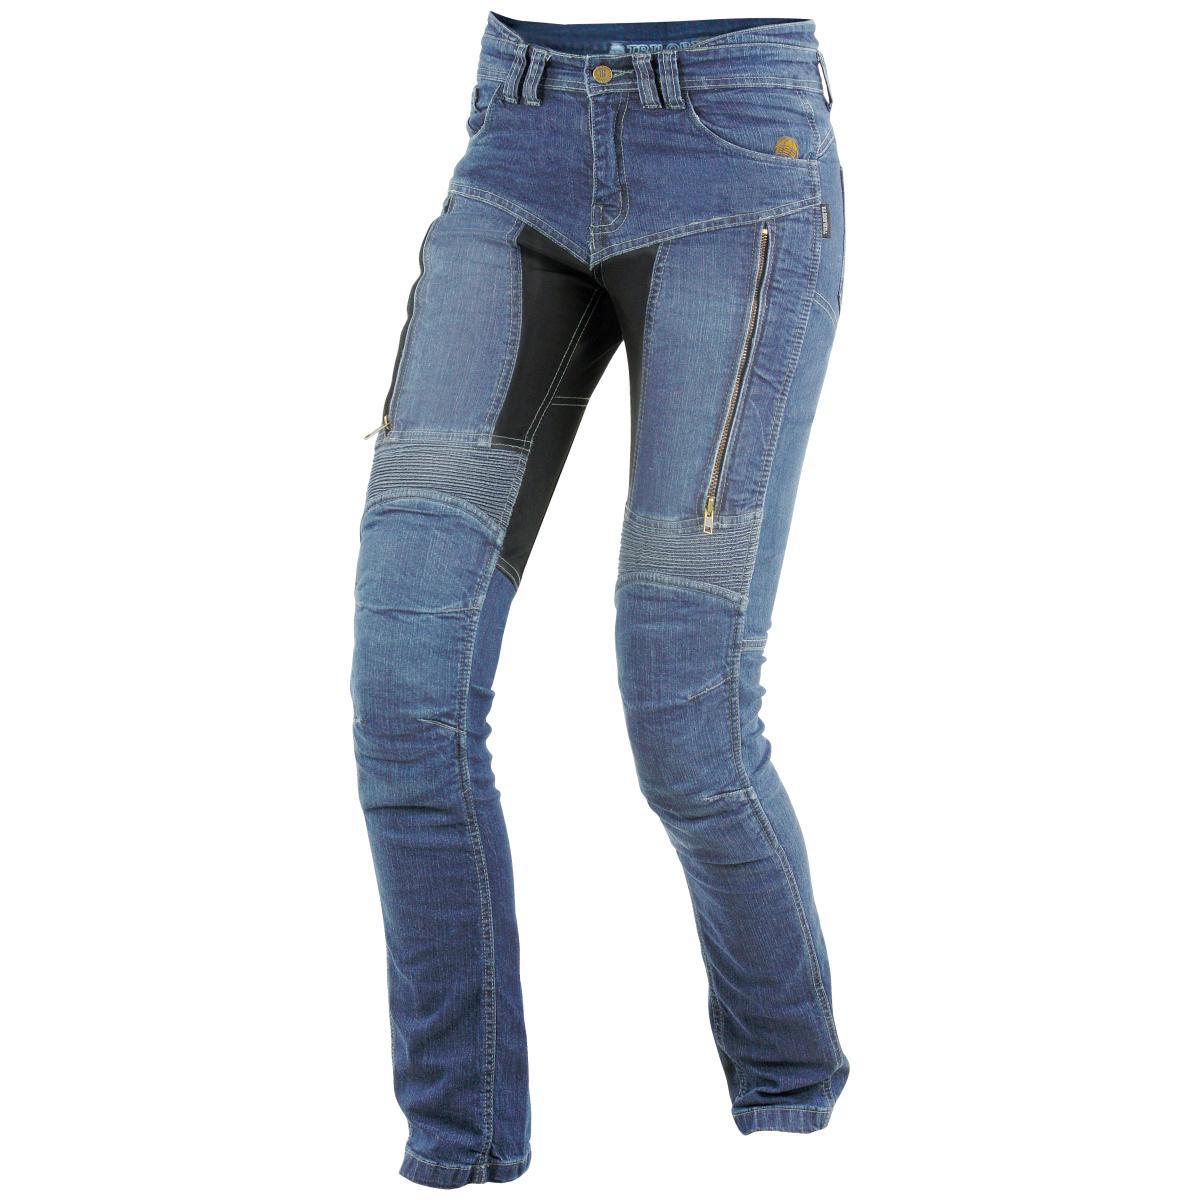 germot trilobite kevlar jeans parado damen jeans hosen frauen. Black Bedroom Furniture Sets. Home Design Ideas